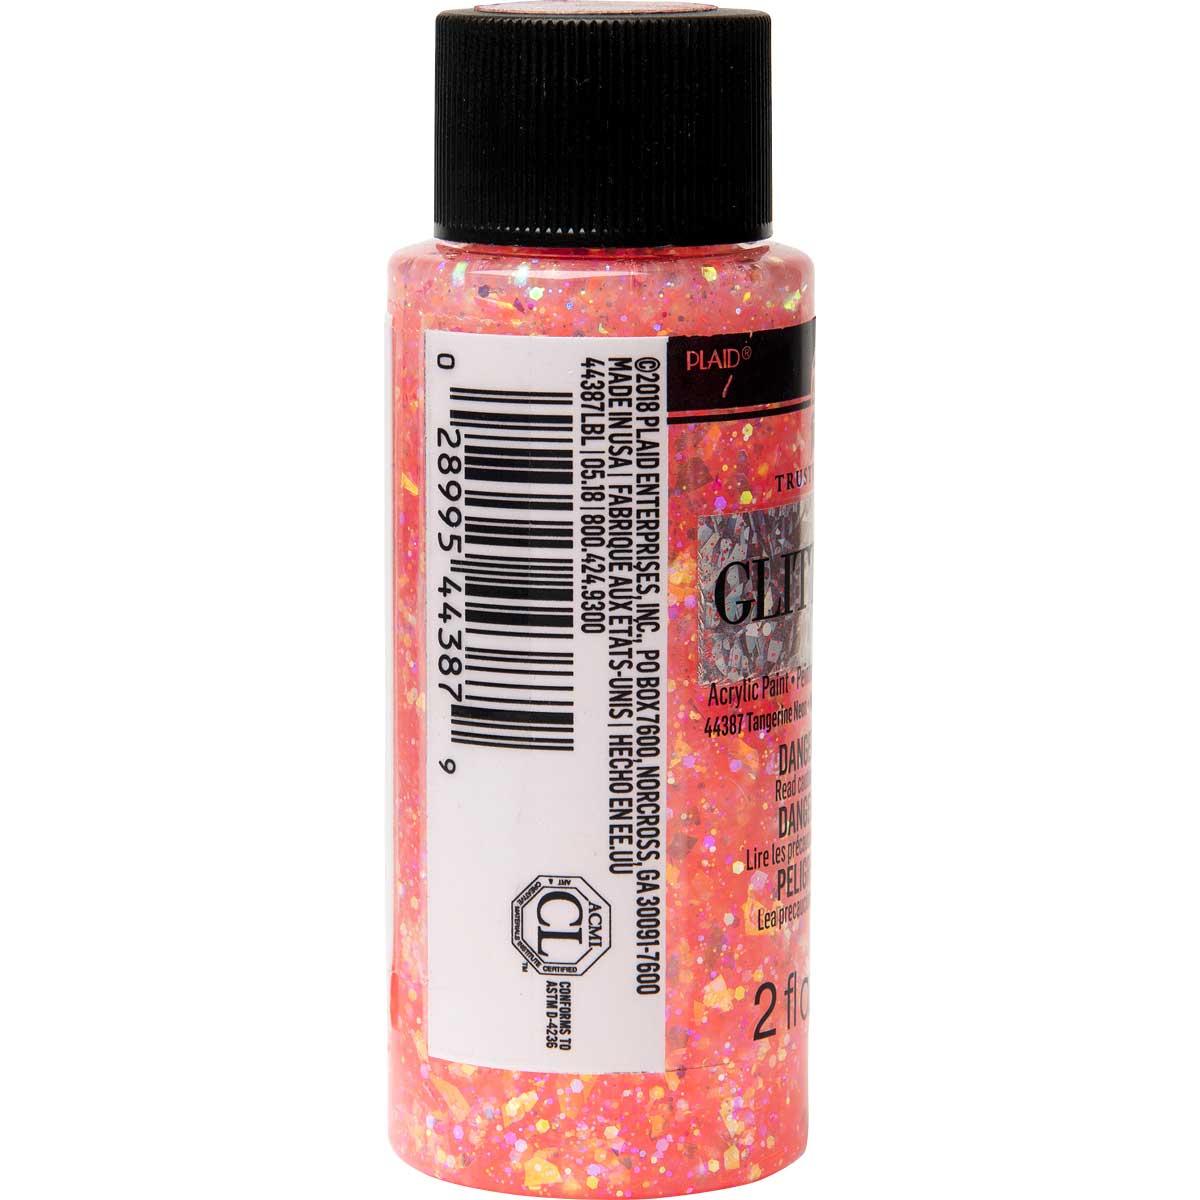 FolkArt ® Glitterific™ Acrylic Paint - Neon Tangerine, 2 oz. - 44387